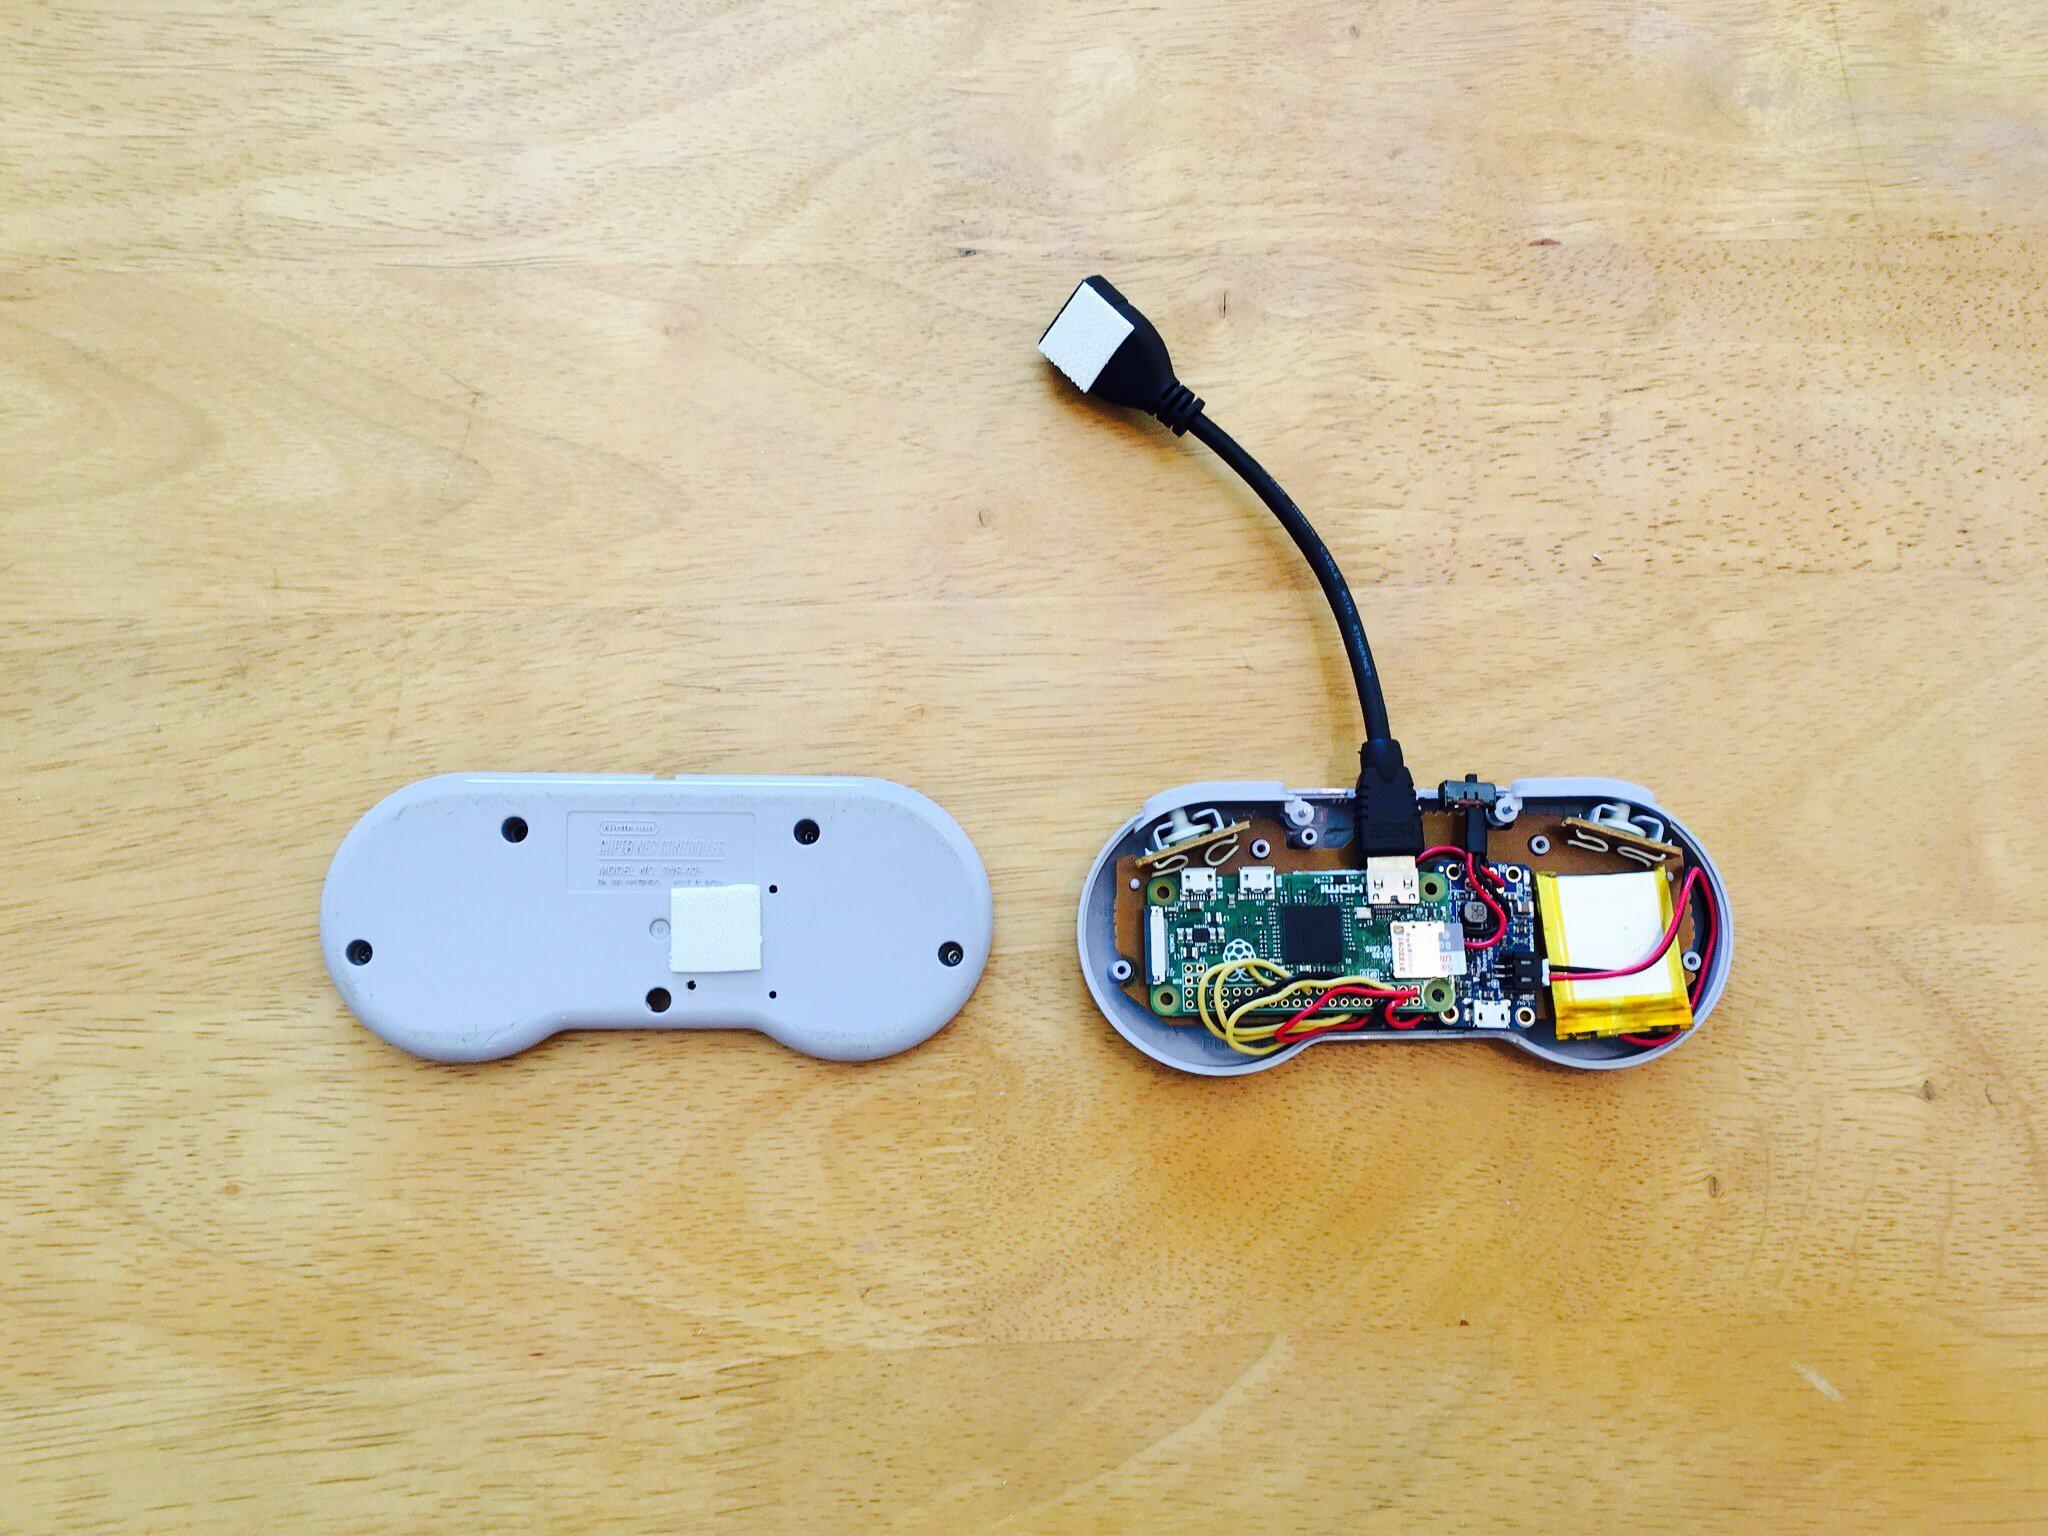 gallery raspberry pi zero inside an snes controller hackaday io